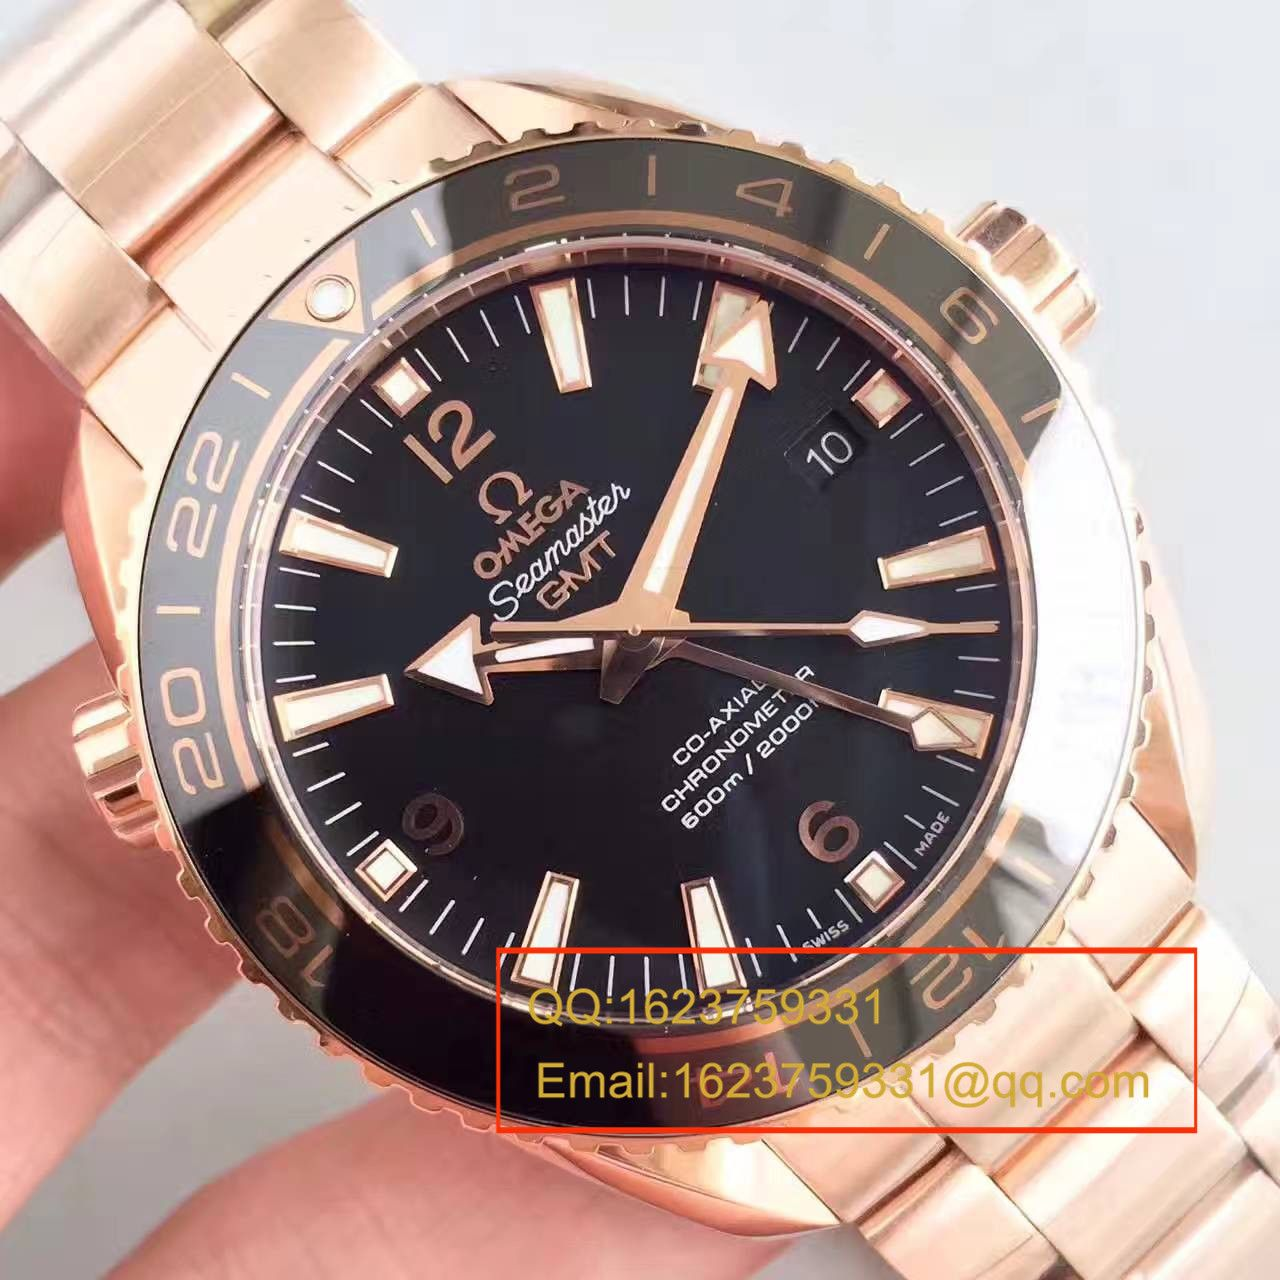 【XF厂《原KW》一比一超A高仿手表】欧米茄海马系列222.60.42.20.01.001腕表 / M265